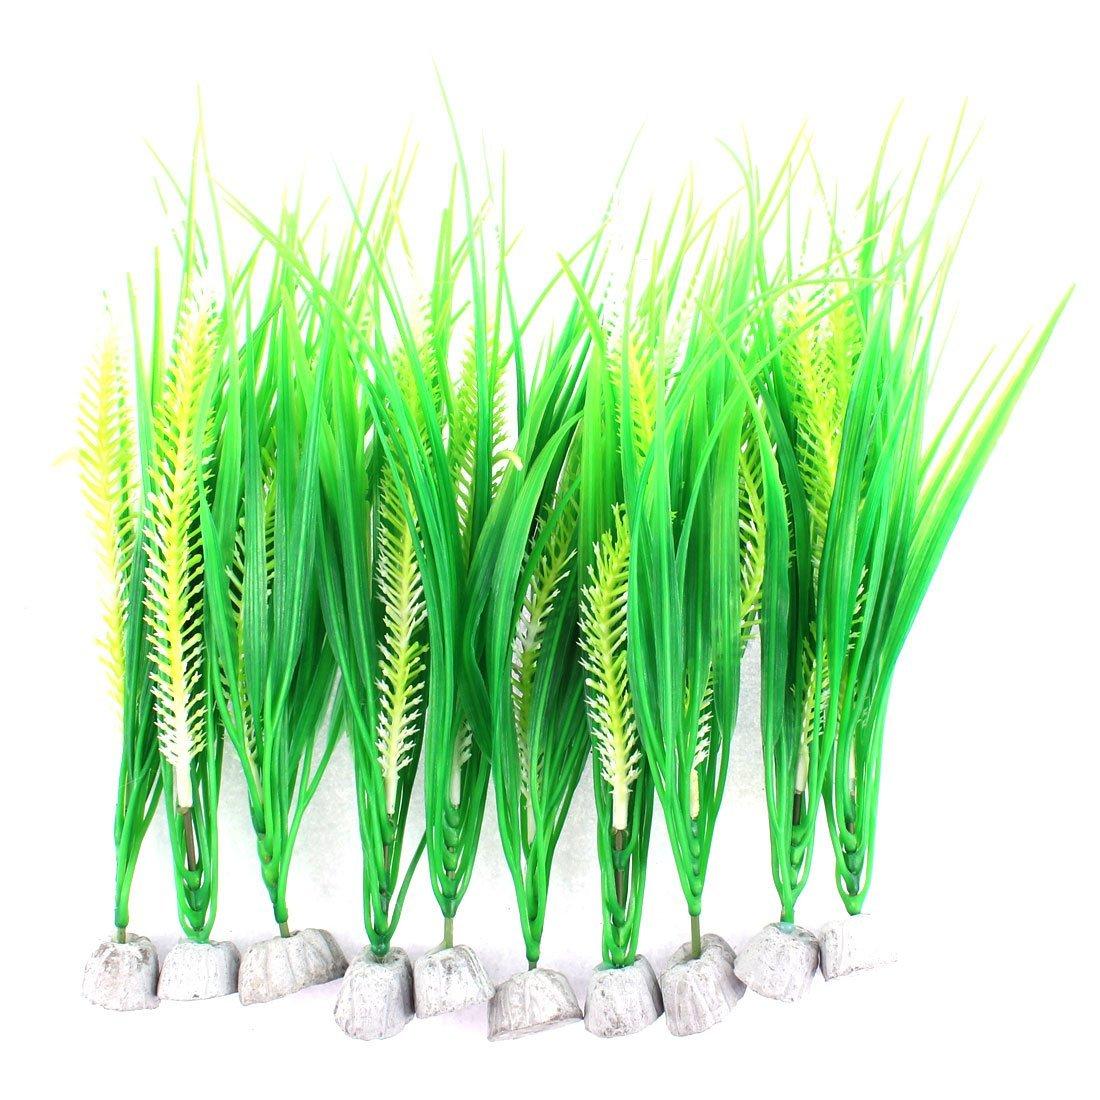 Plastic Aquarium Water Plant Grass Embellishment 23.5cm High 10pcs